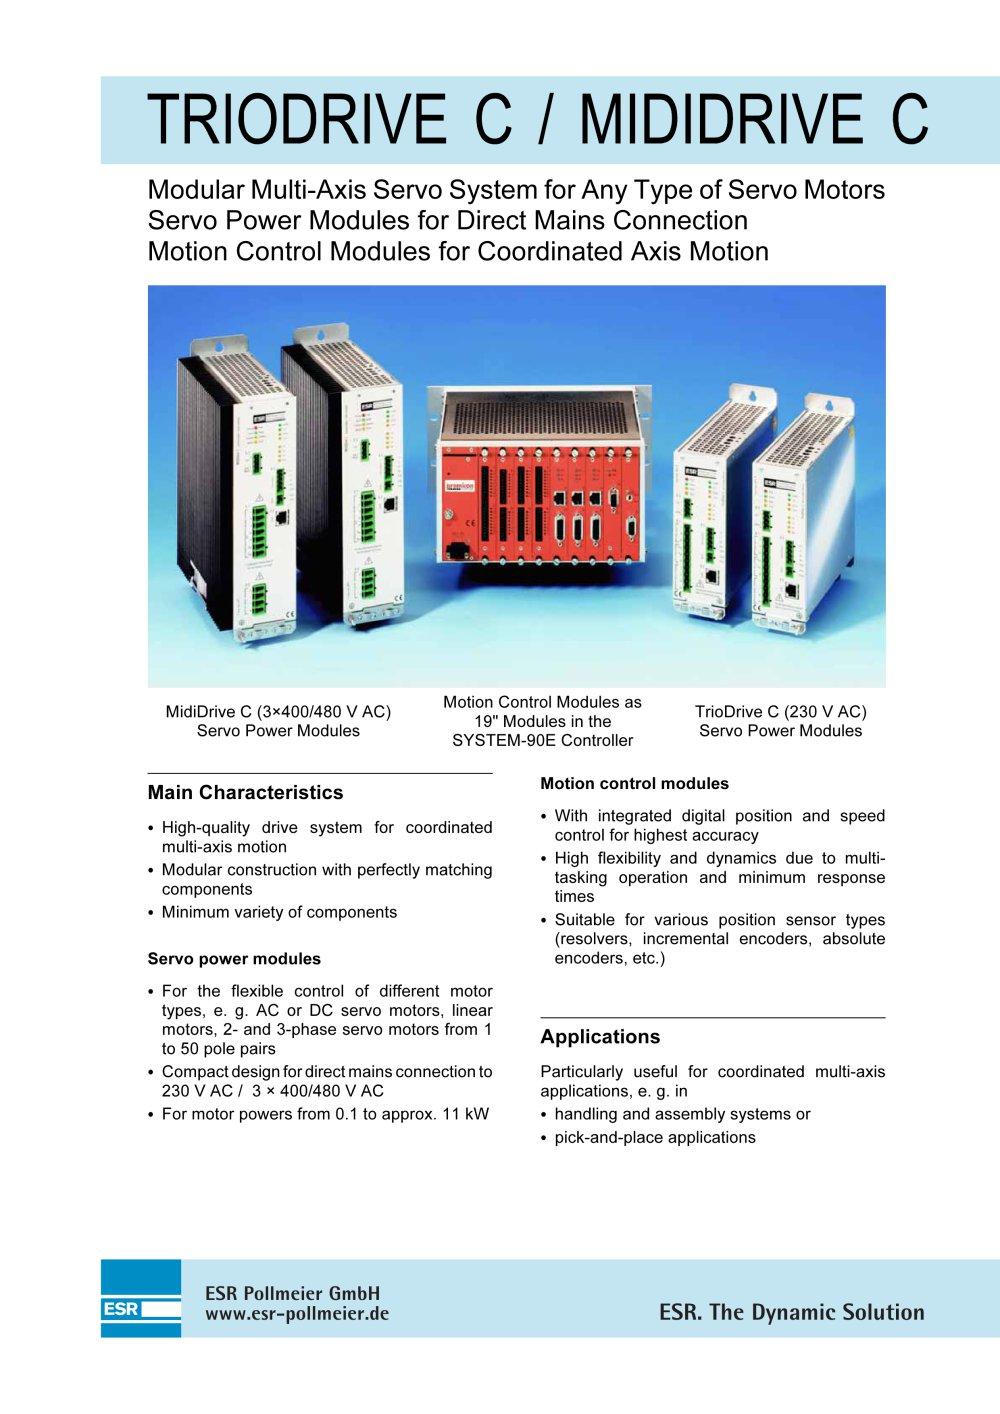 6620.250 ? TrioDrive C / MidiDrive C - ESR Pollmeier - PDF Catalogue ...